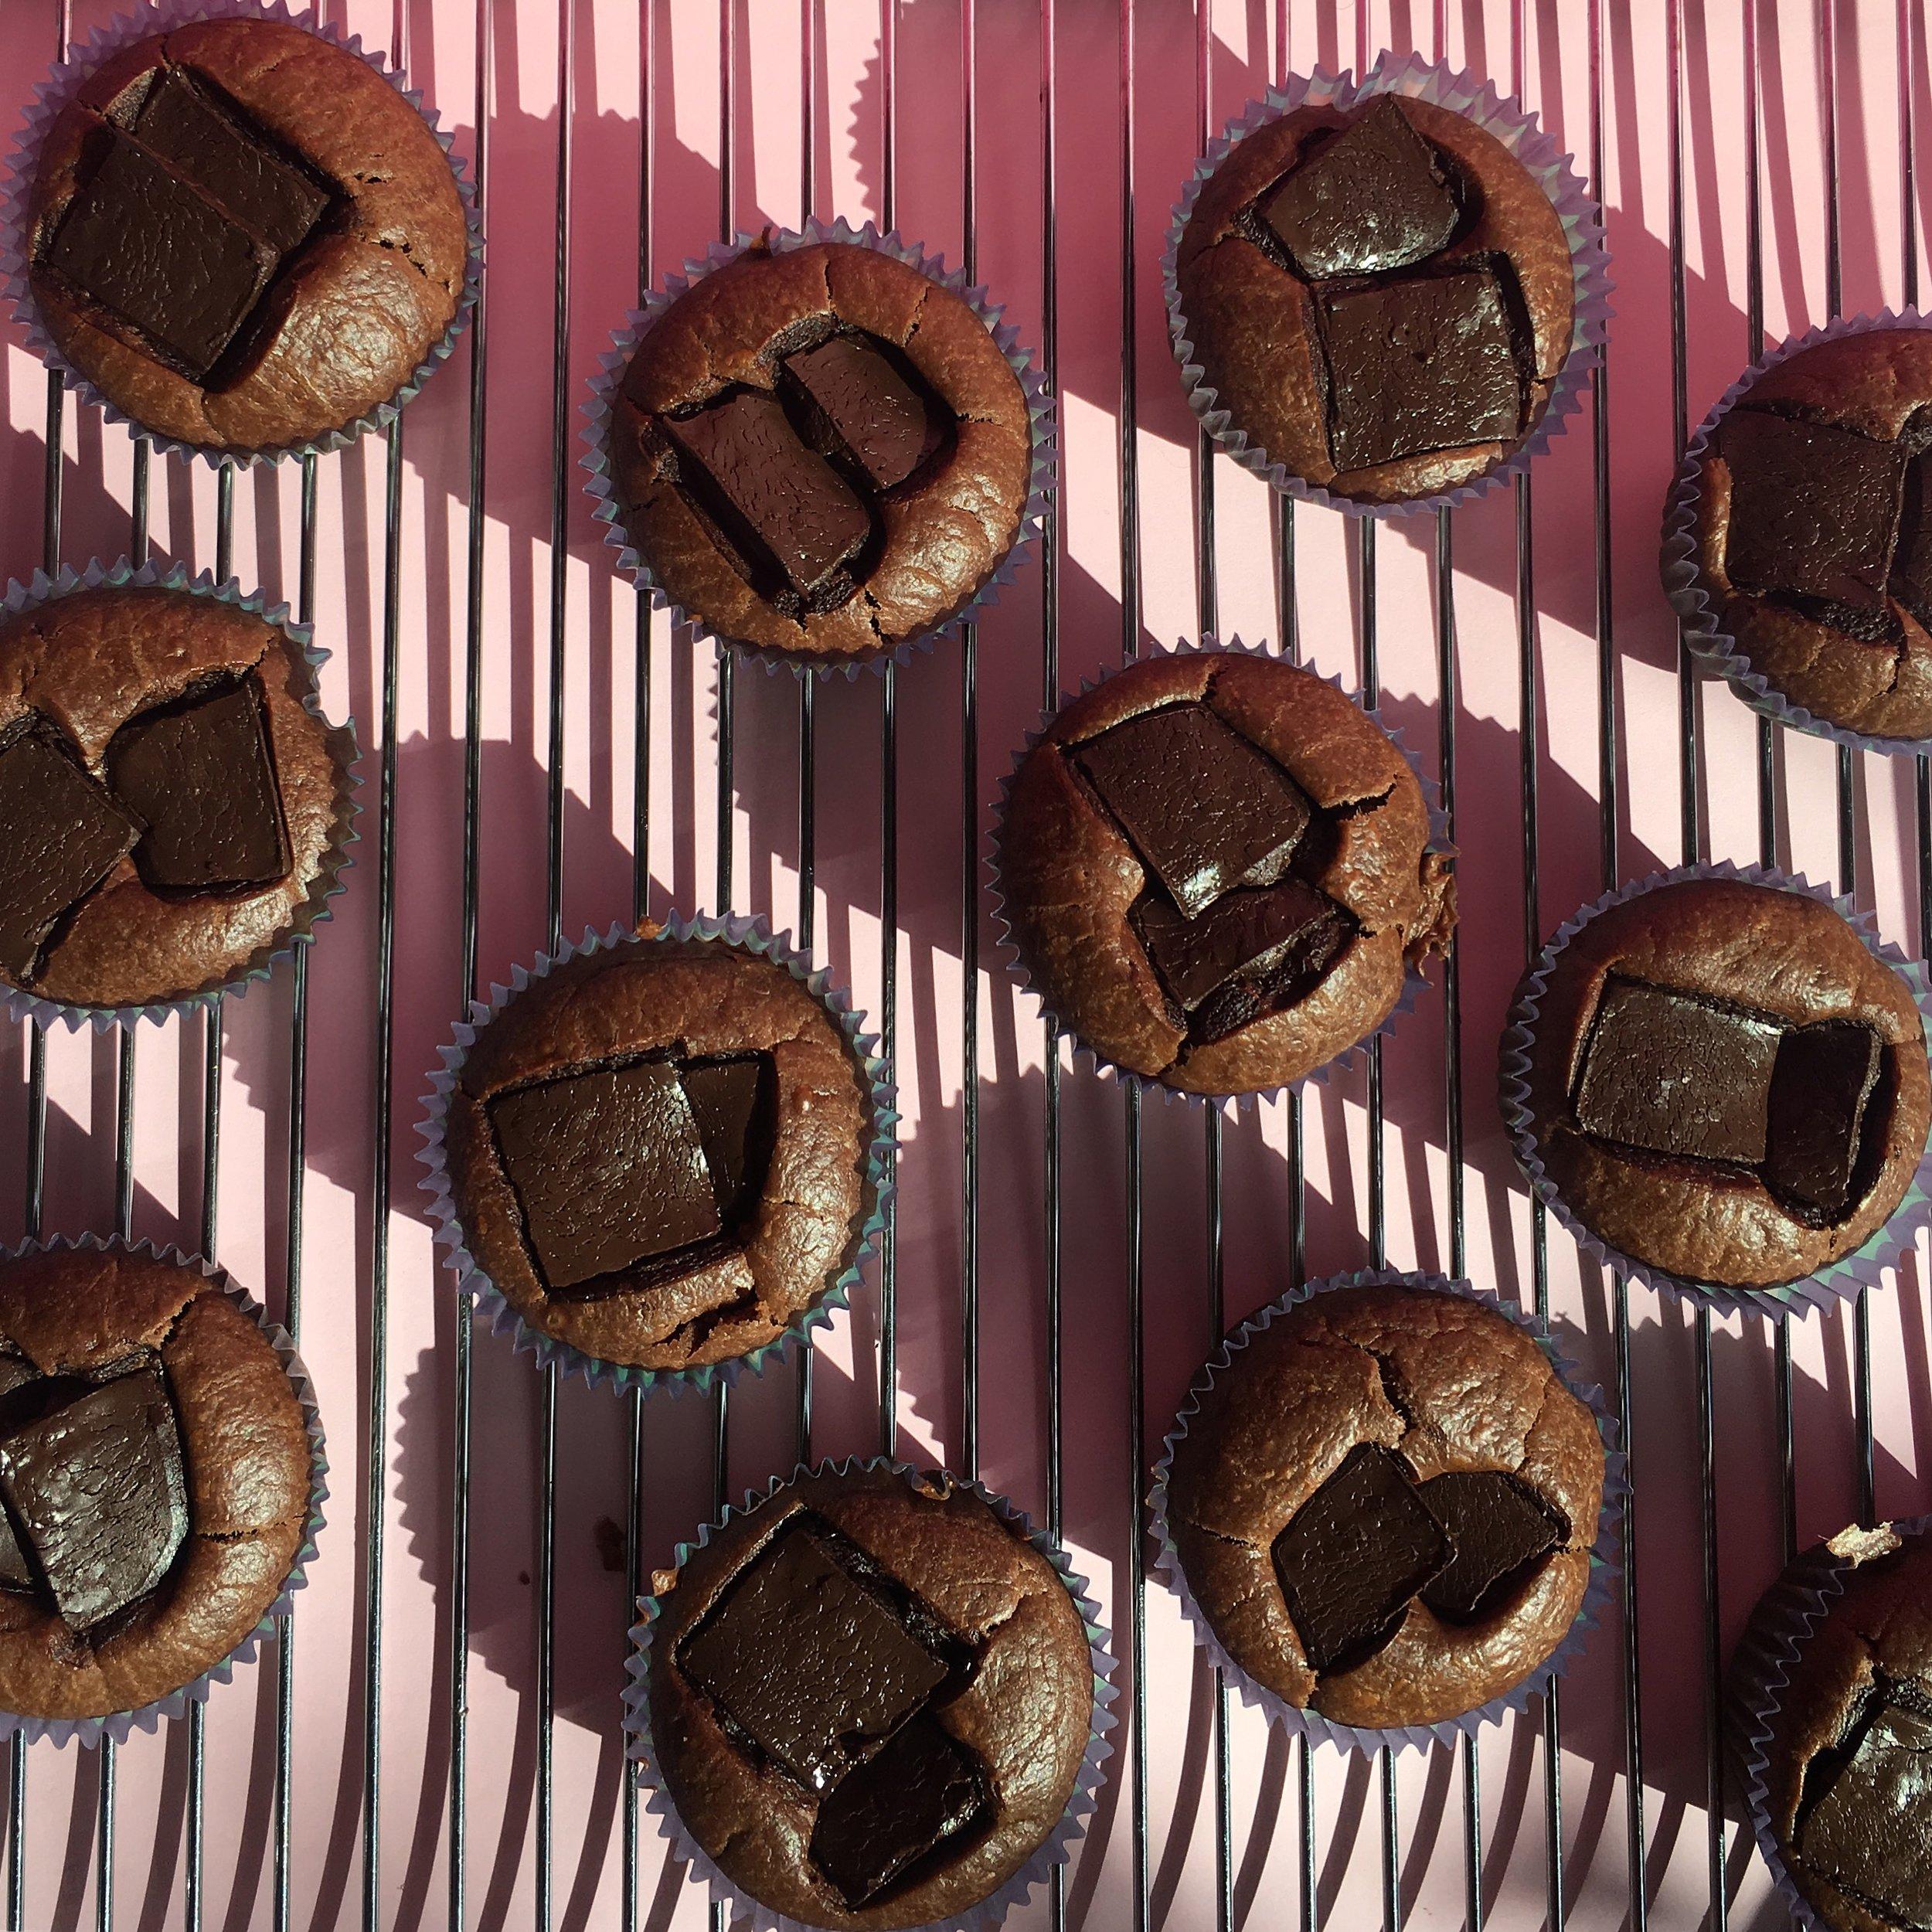 Delicious vegan chocolate cupcake in baking tray